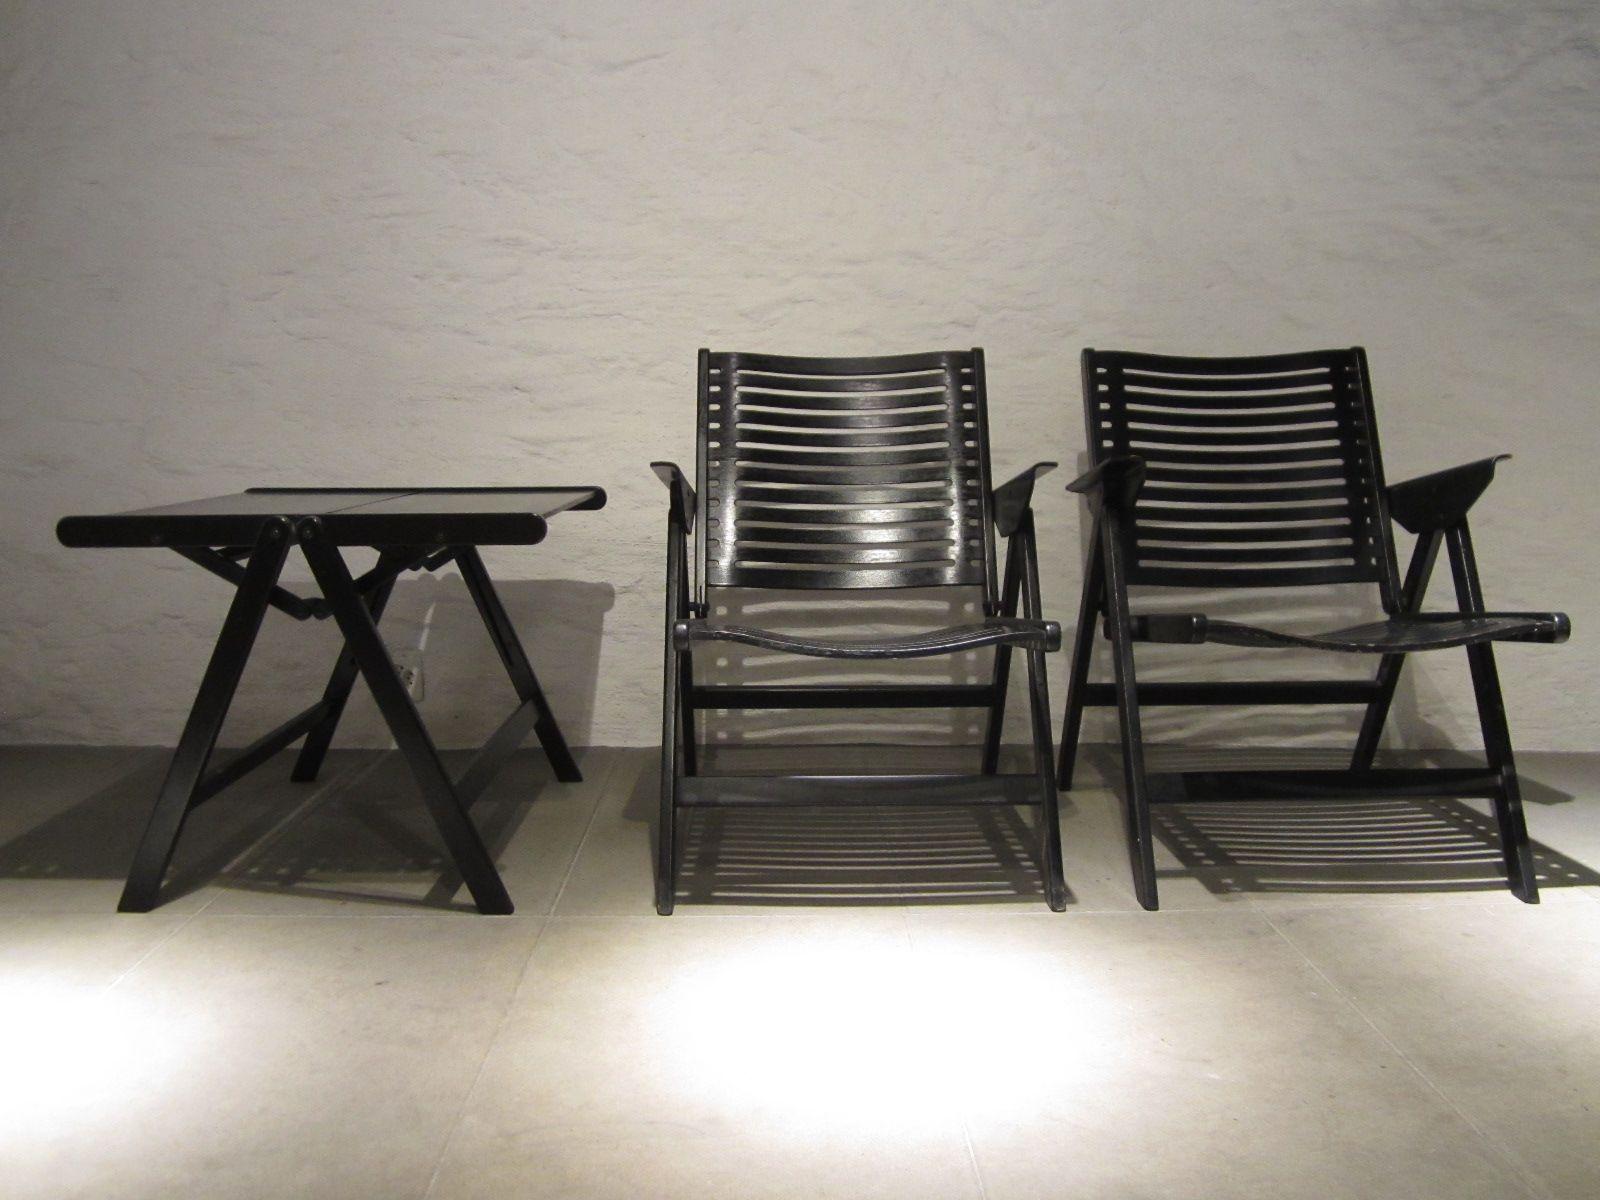 Vintage Rex Chairs & Coffee Table by Niko Kralj for Stol Kamnik